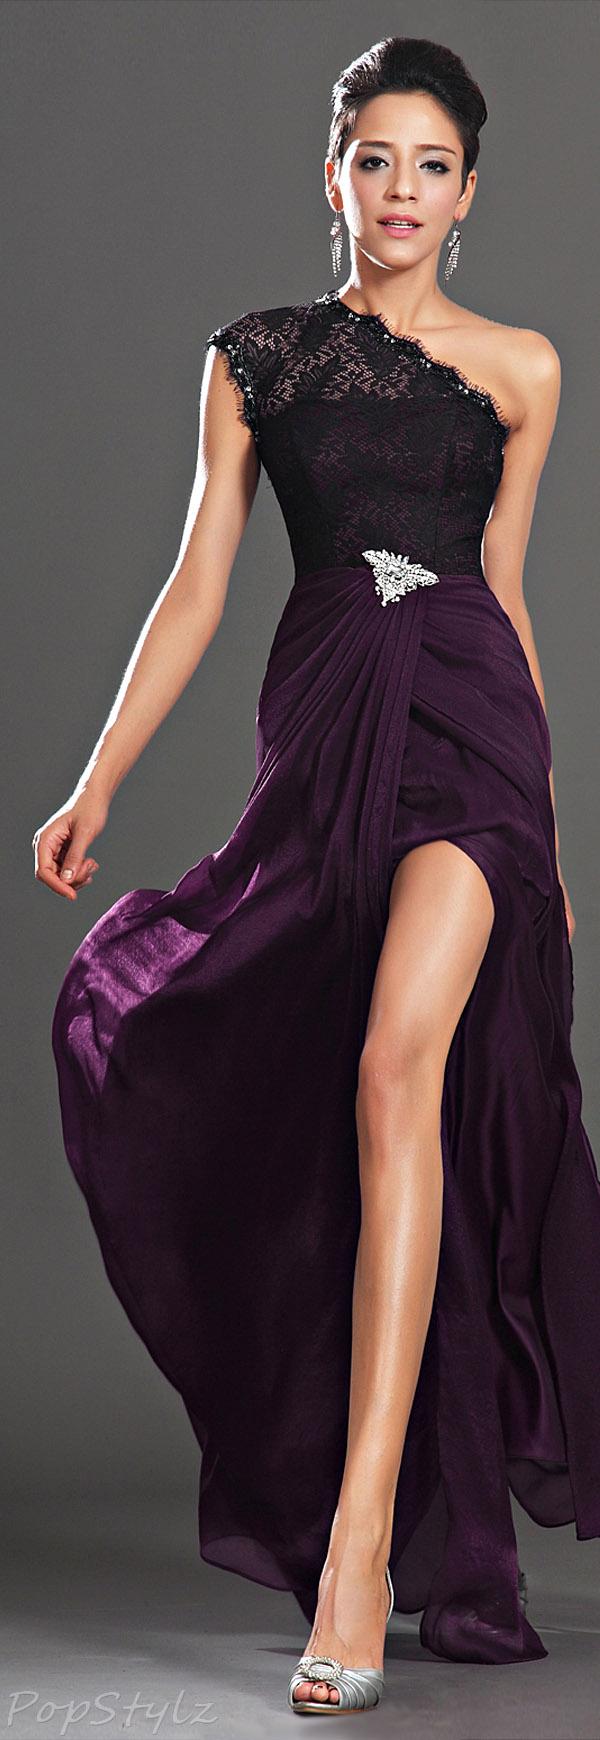 eDressit Lace Shoulder Evening Gown